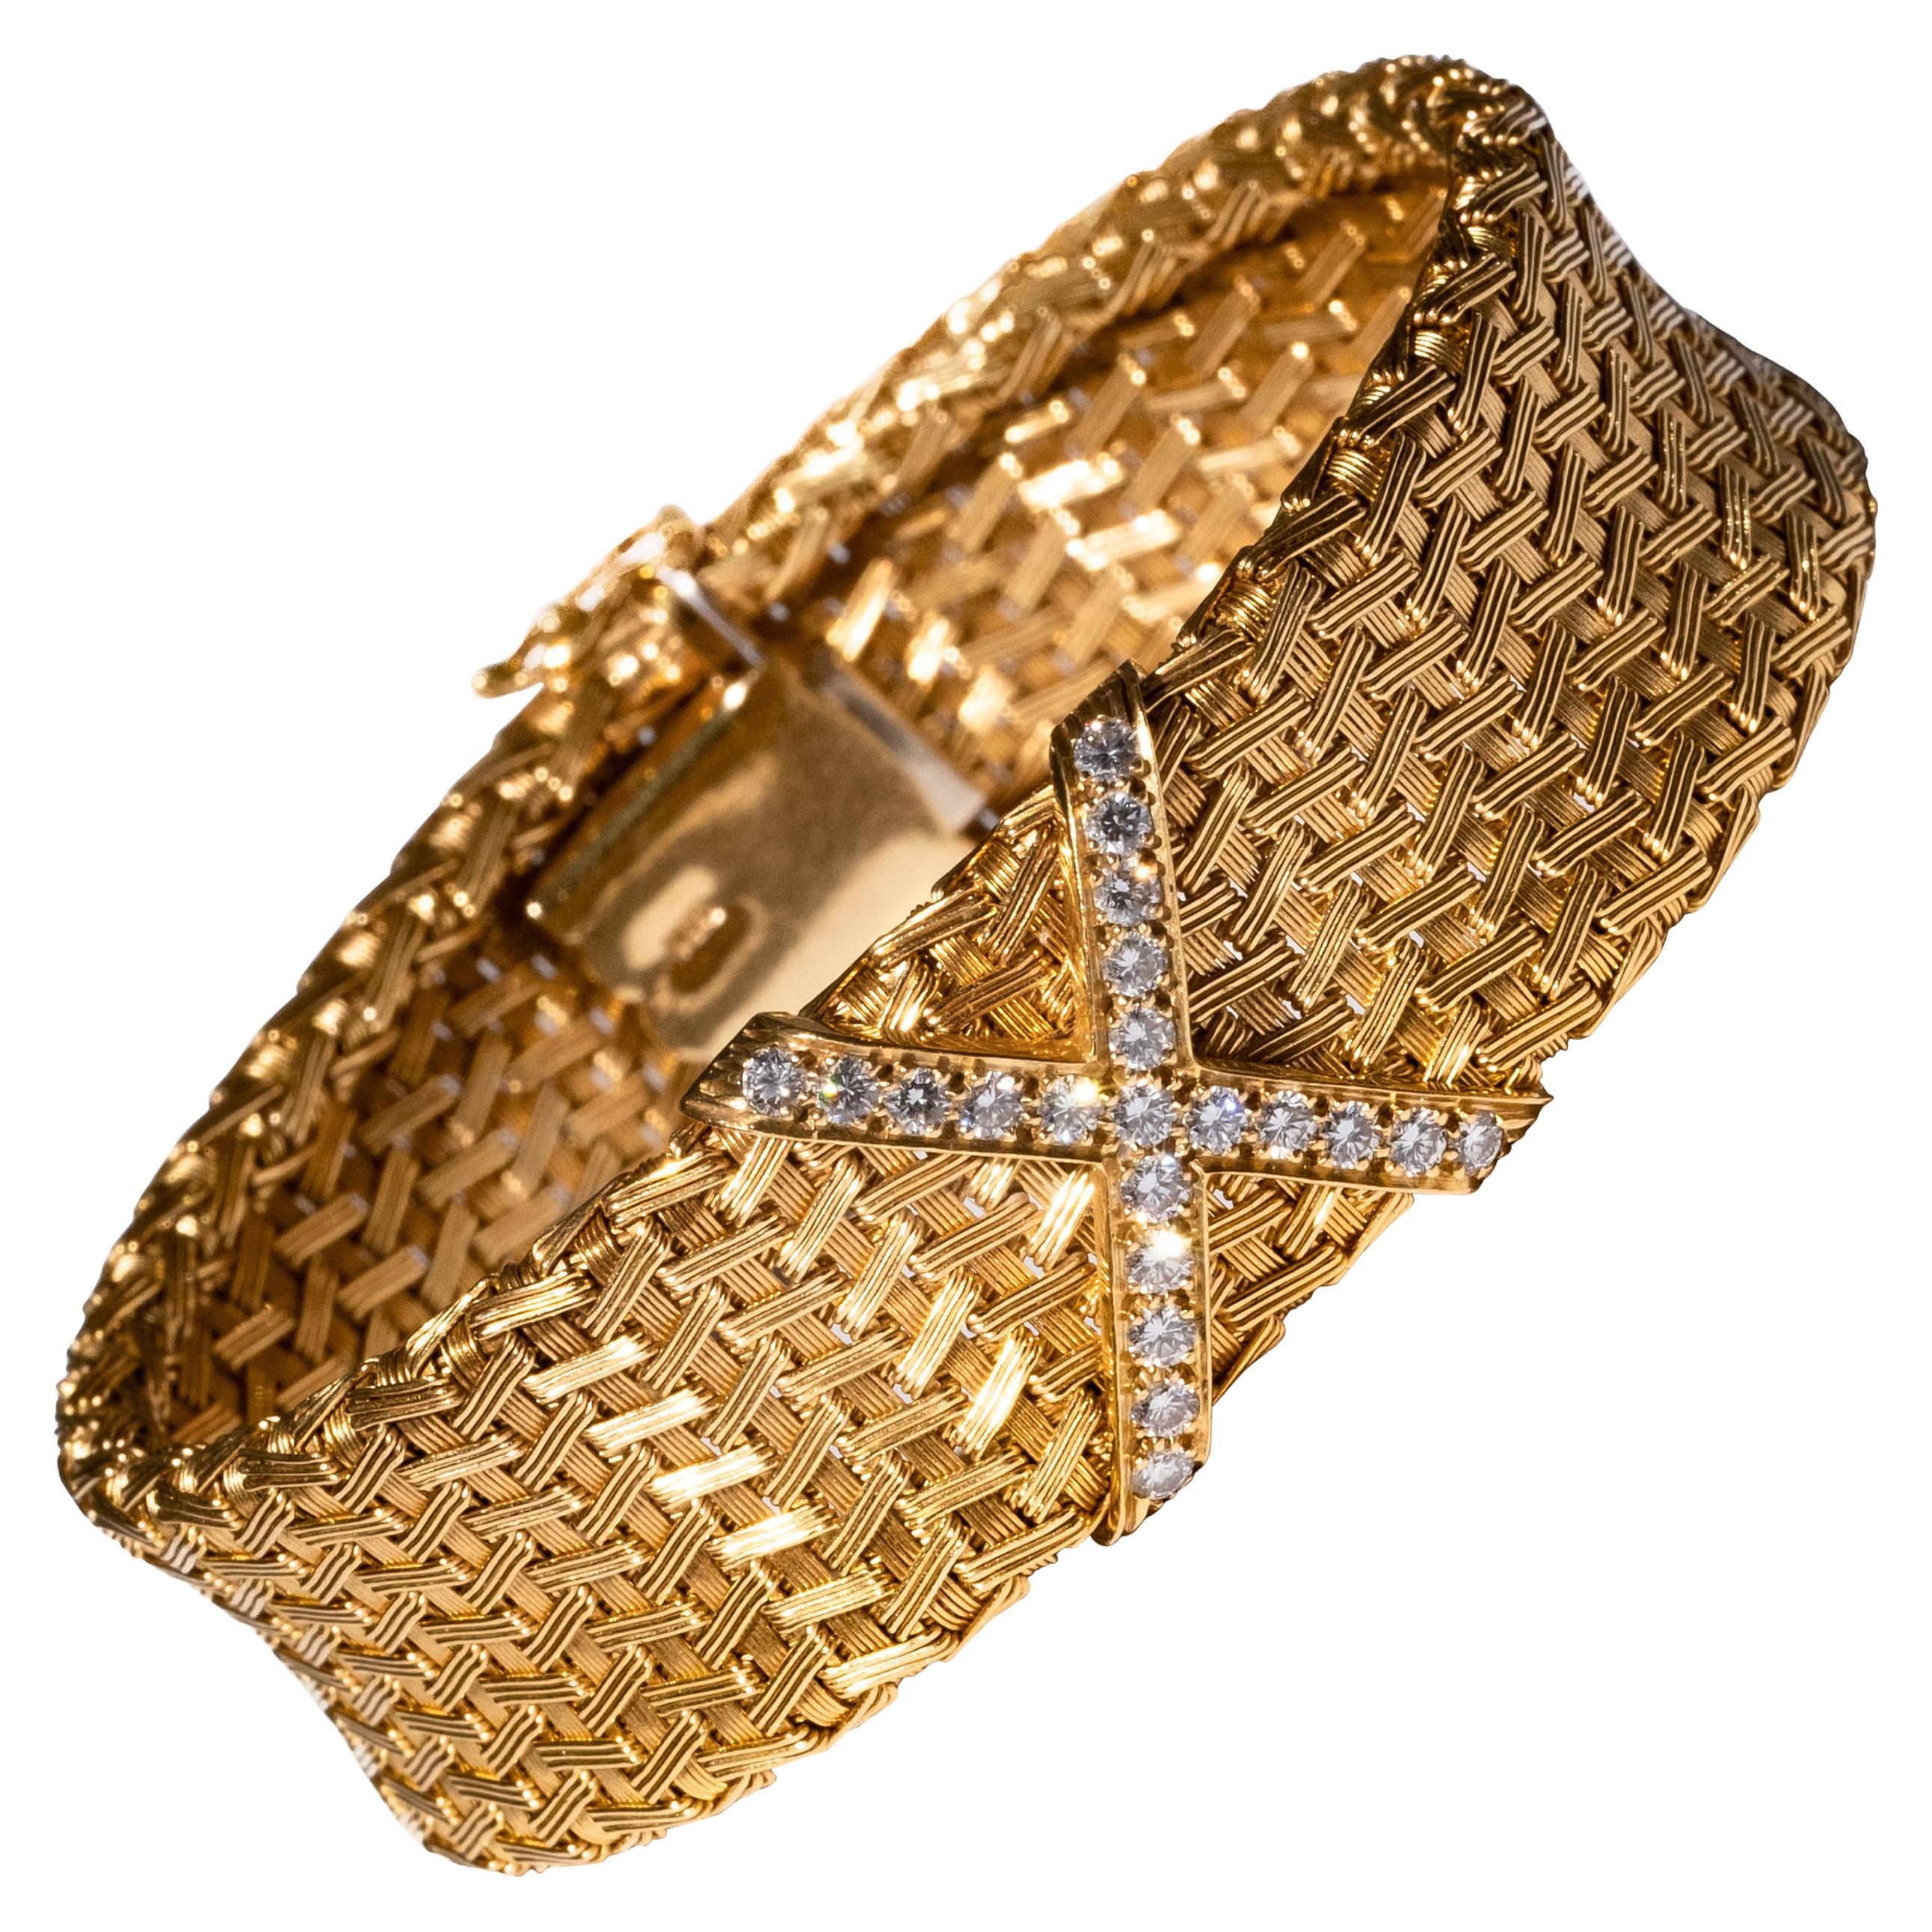 Tiffany & Co. 18K Gold and Diamond Criss Cross Bracelet